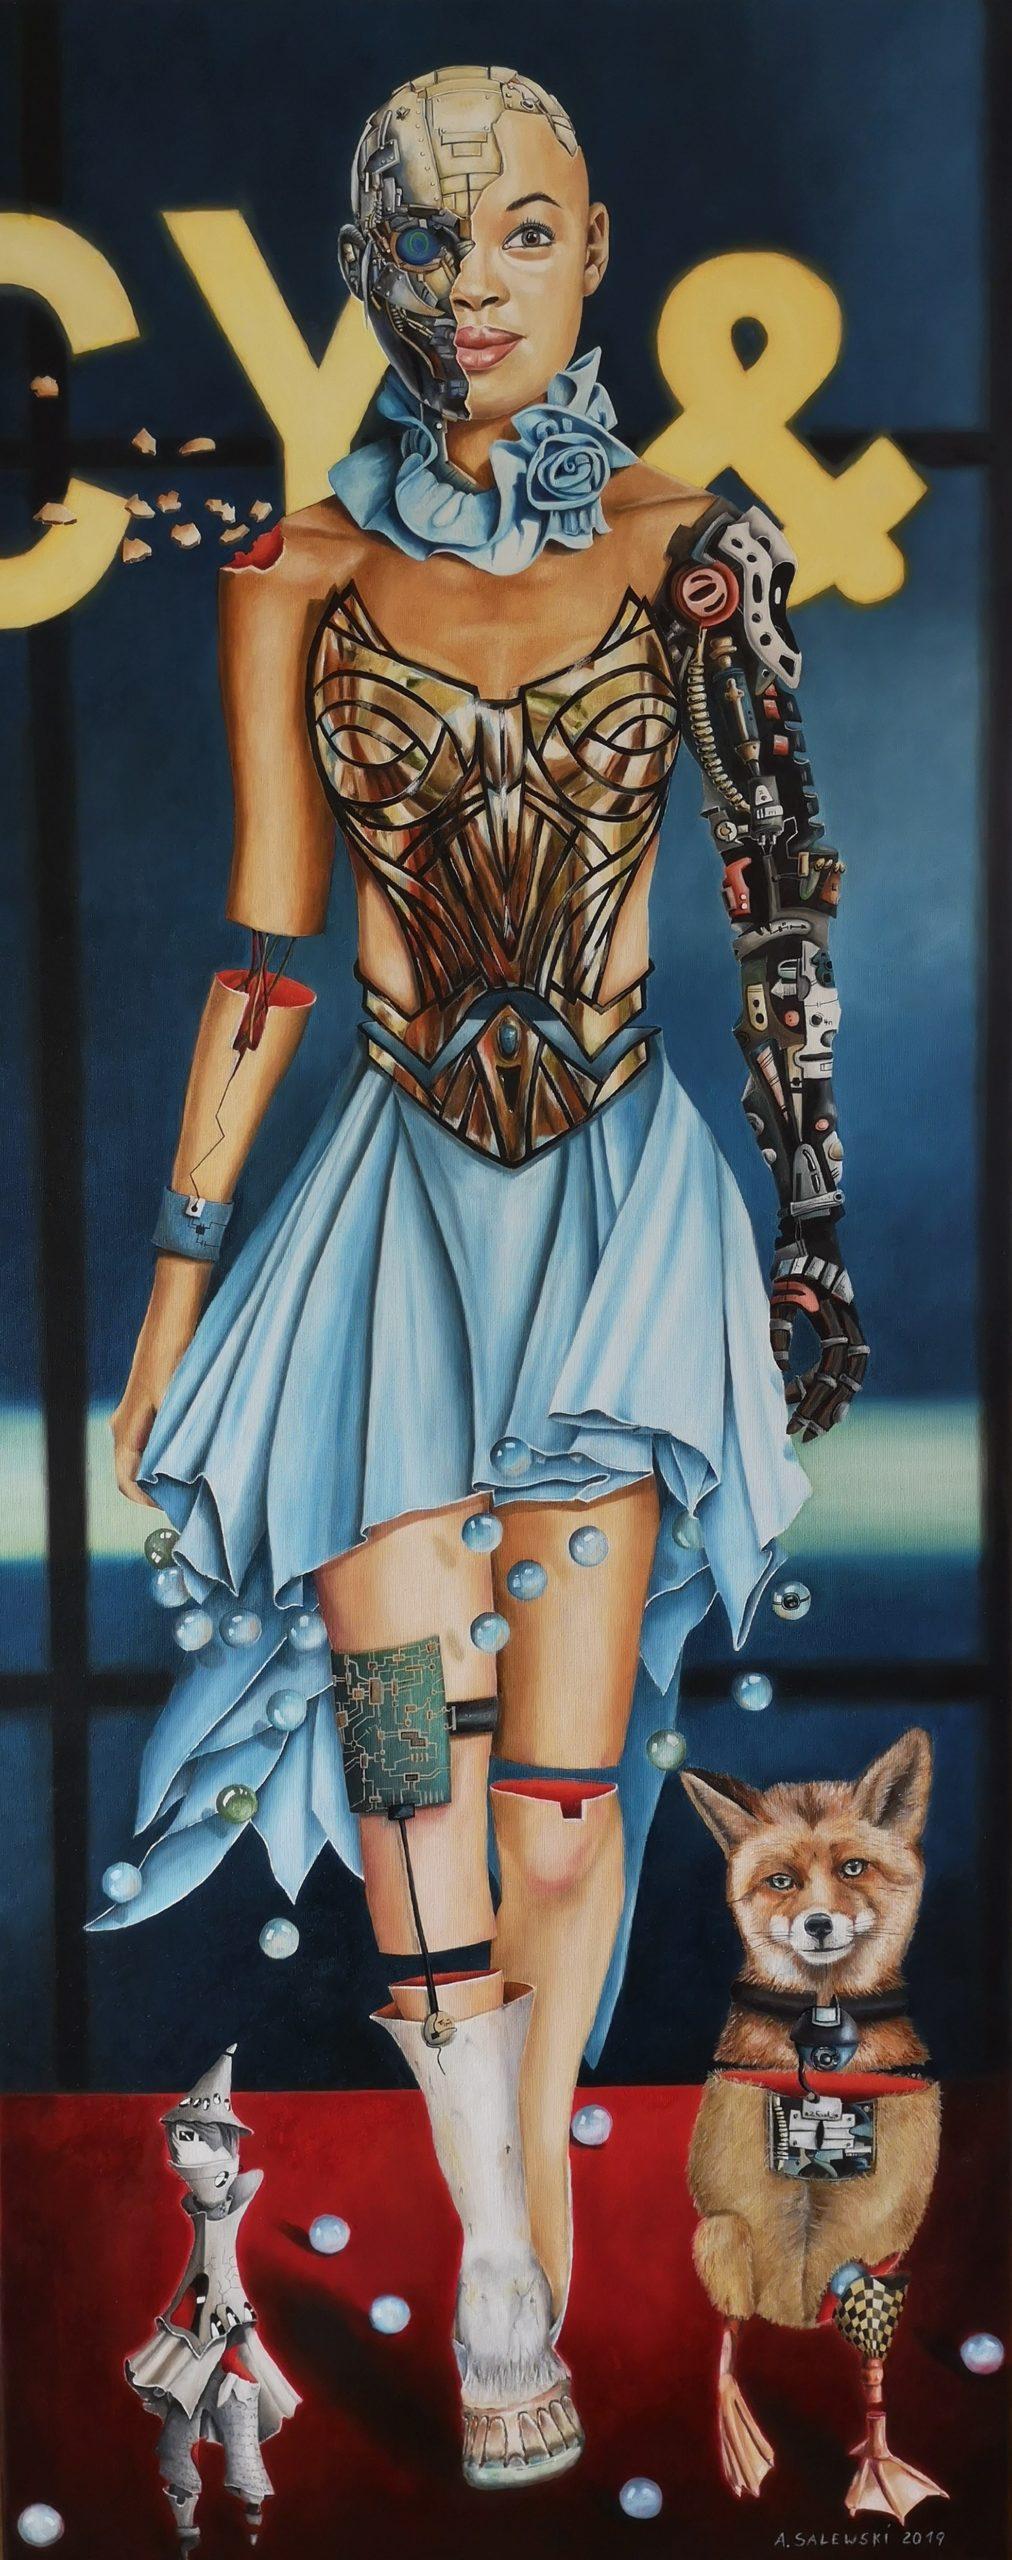 Astrid Salewski | It's fashion I | Öl auf Leinwand | 60 x 150 cm | 2019